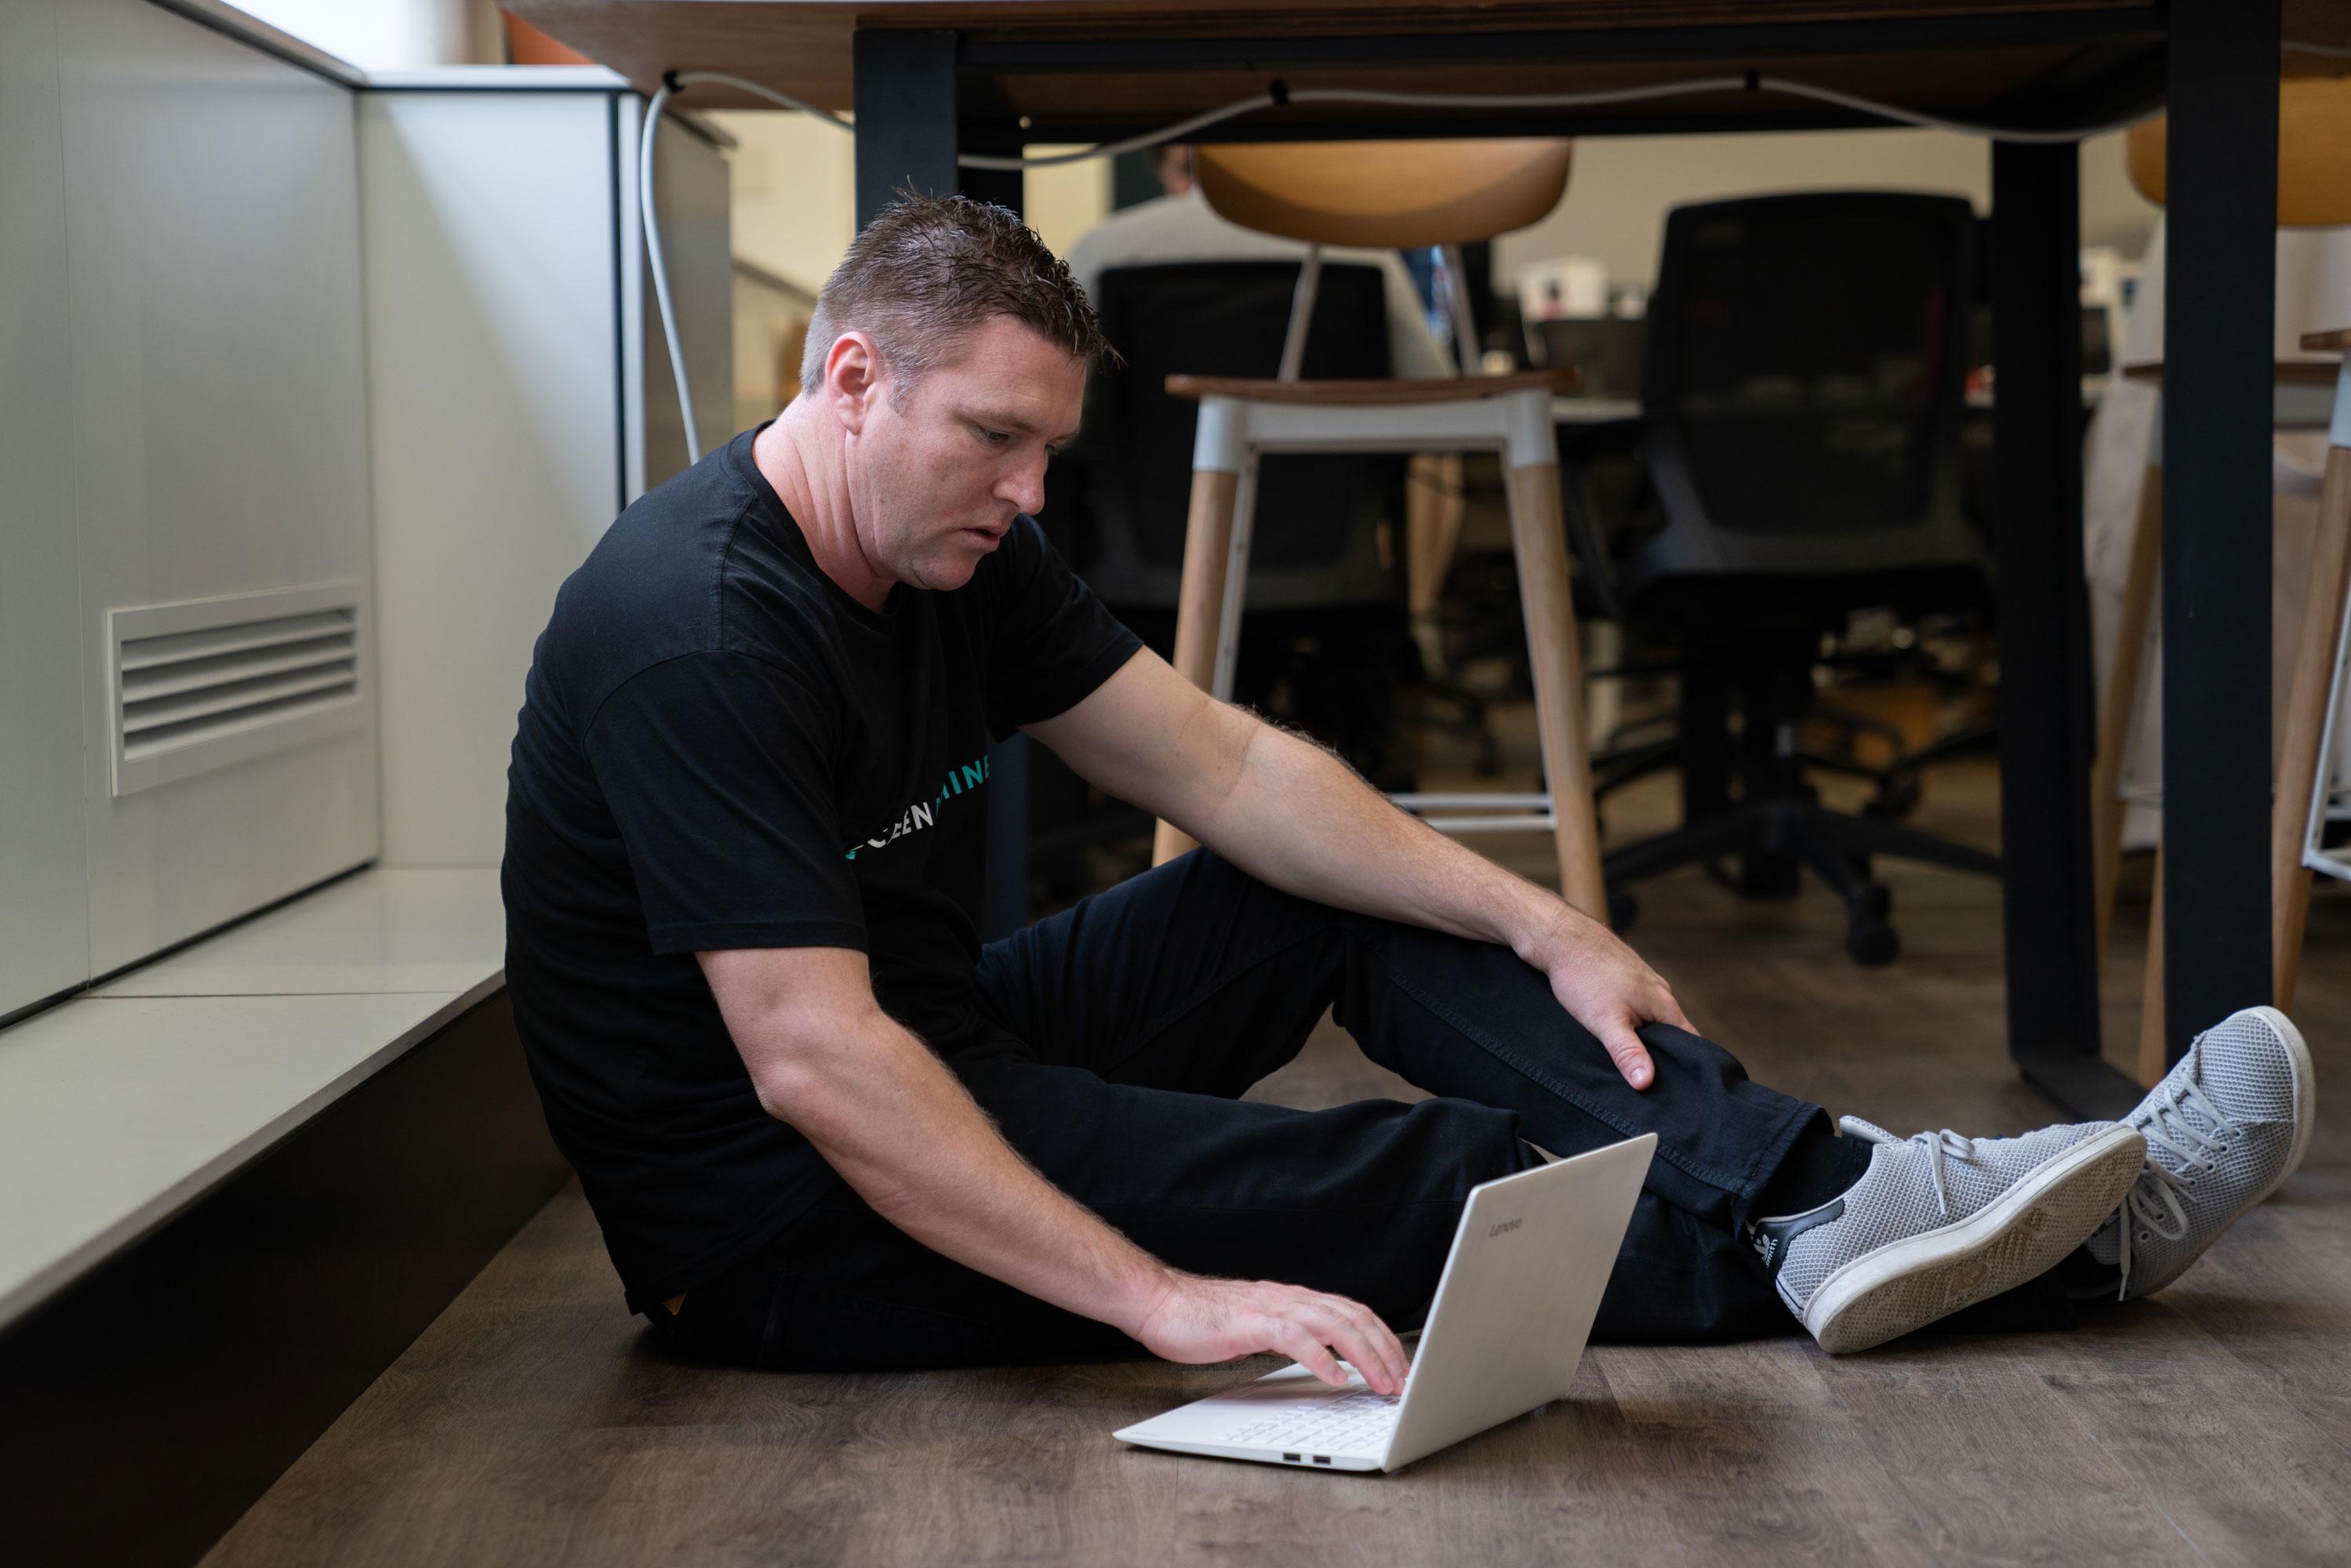 Start up founder Morgan of Screen Dopamine working on laptop under desk